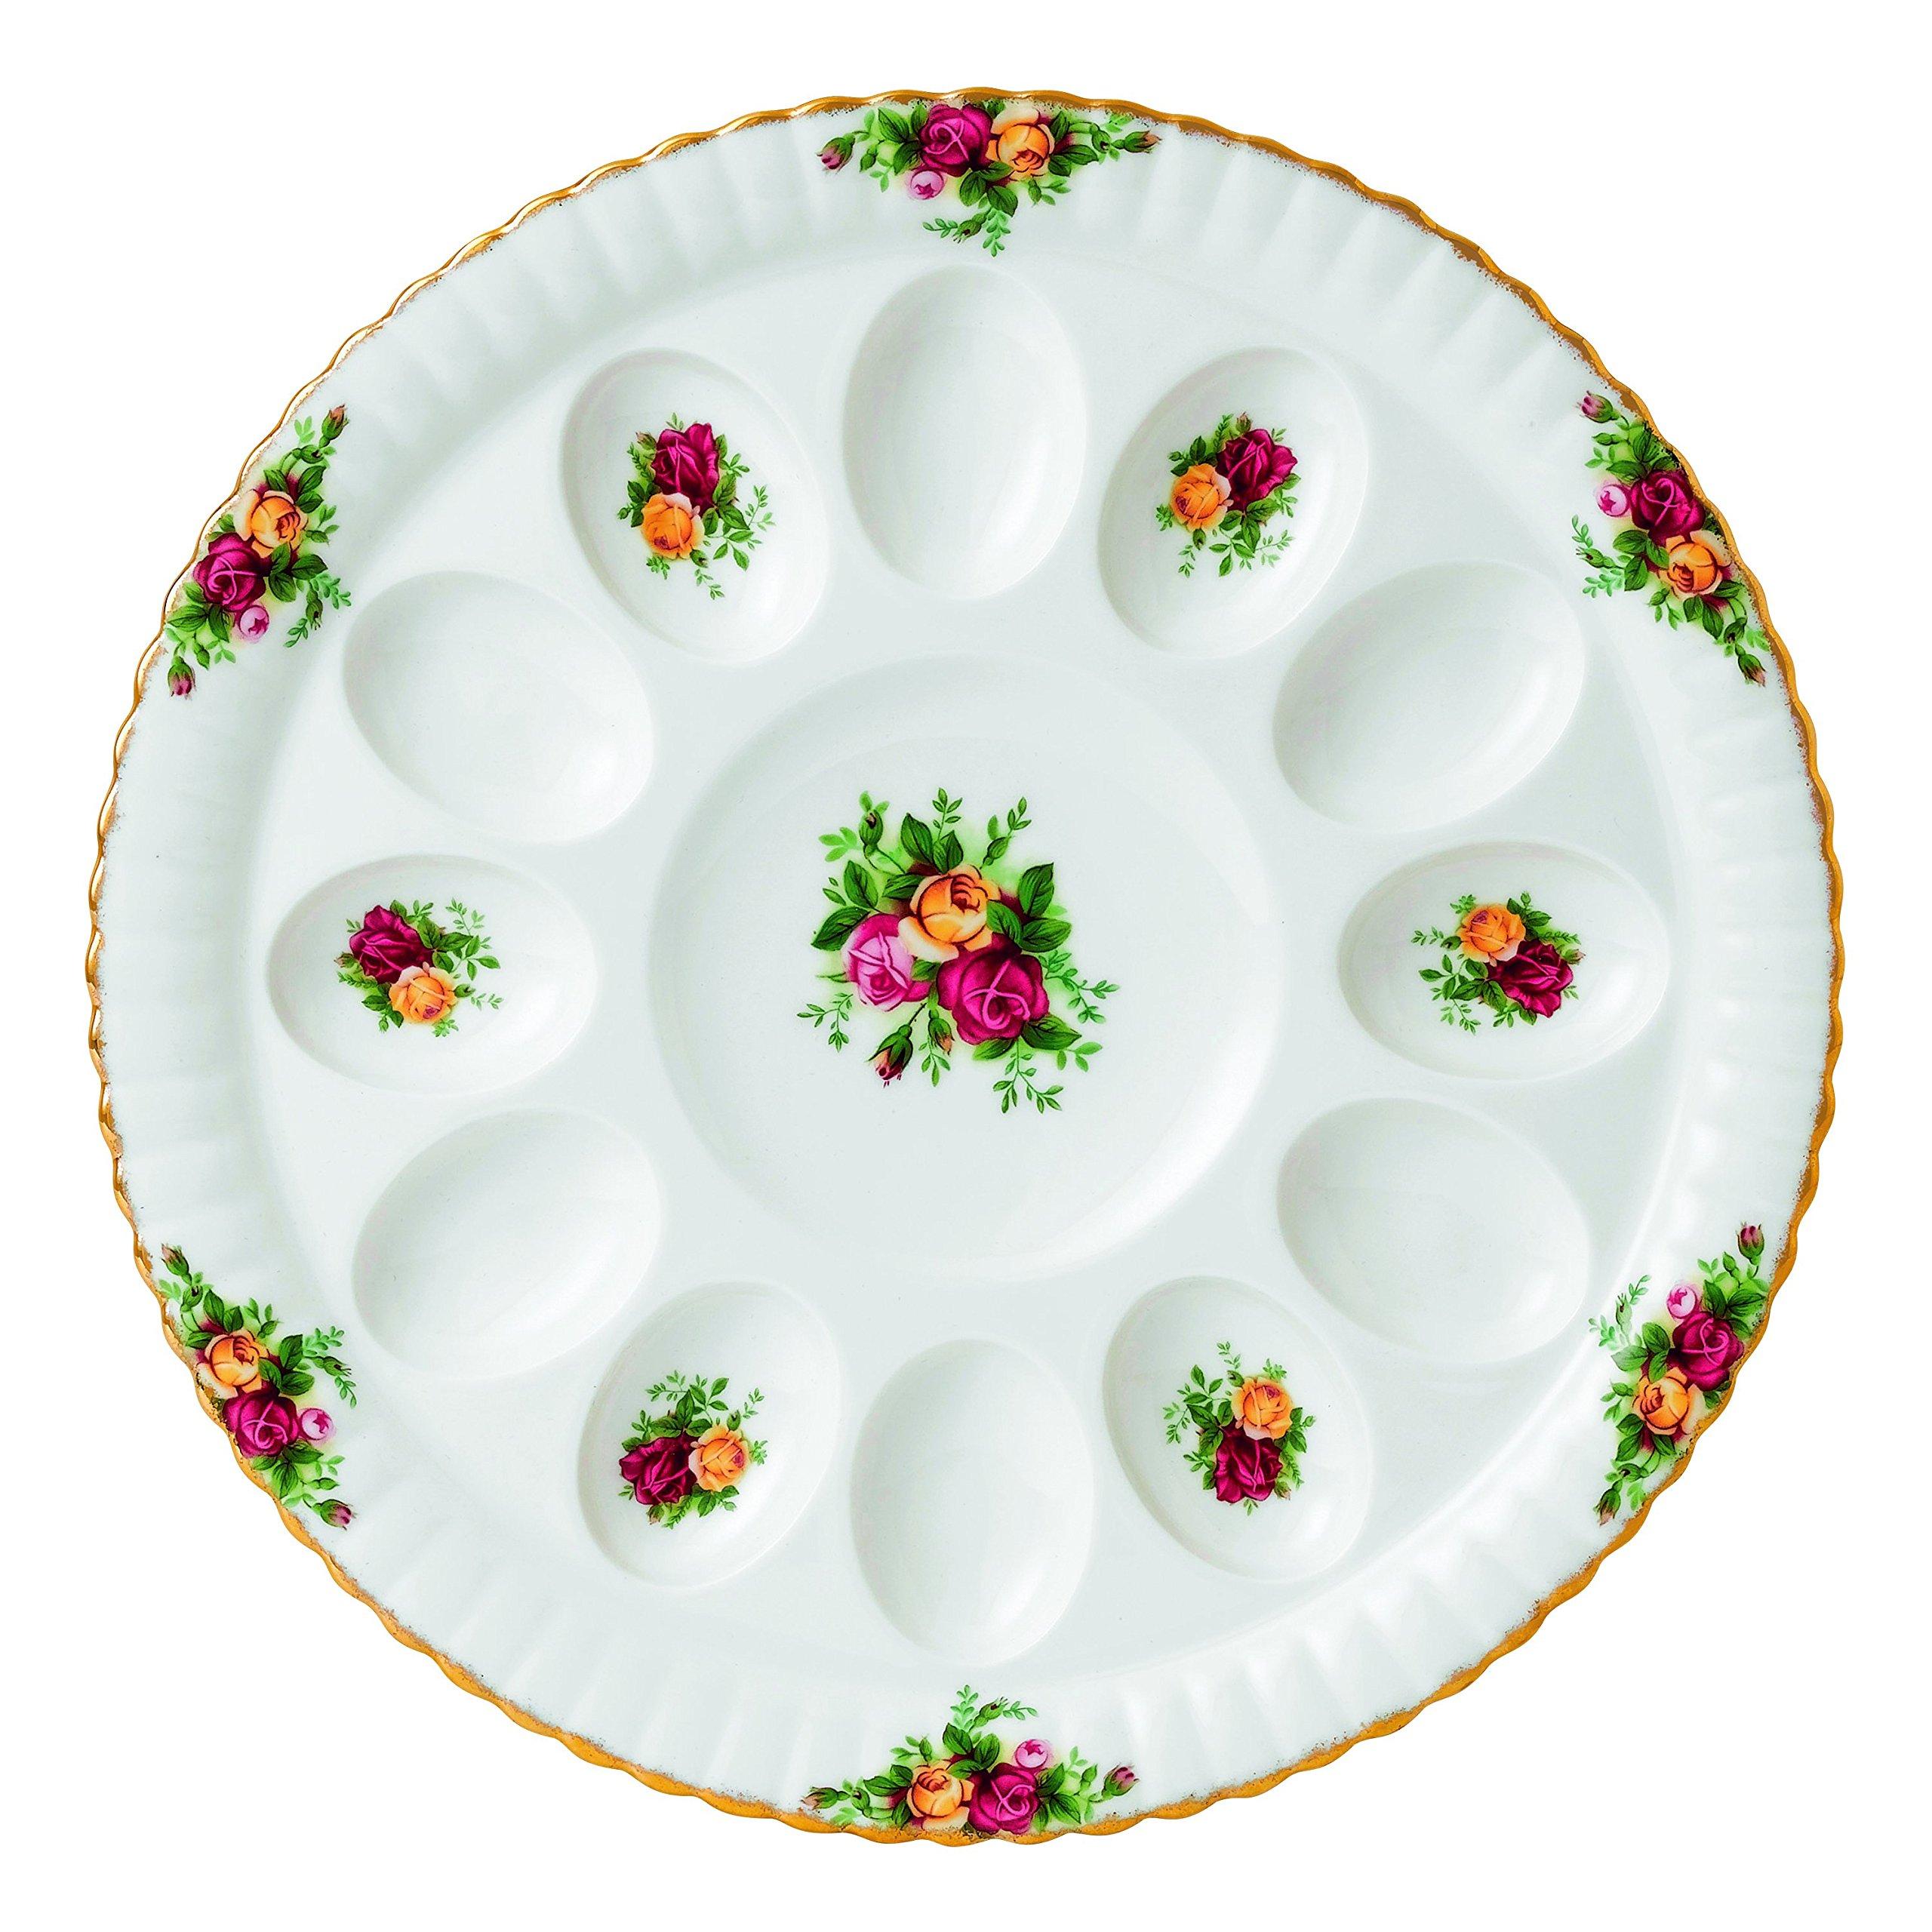 Royal Albert Old Country Roses Deviled Egg Dish, 11.5''